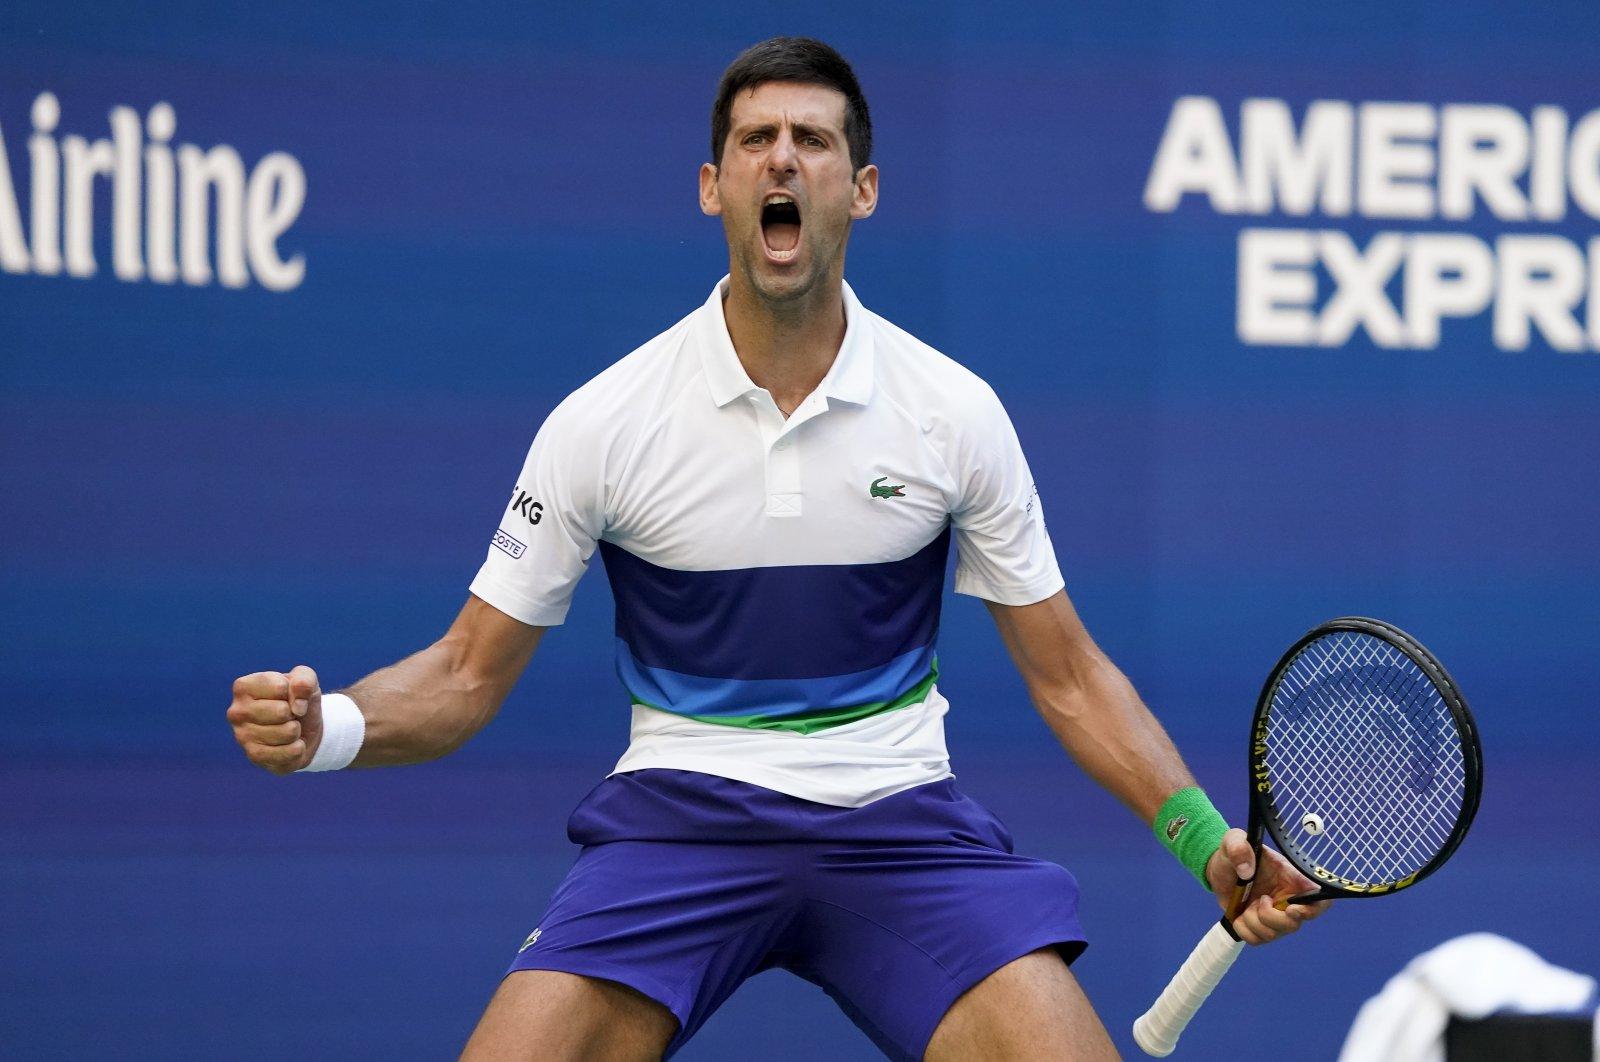 Serbia's Novak Djokovic reacts after scoring a point against Japan's Kei Nishikori in their U.S. Open third-round match, New York, U.S., Sept. 4, 2021. (AP Photo)